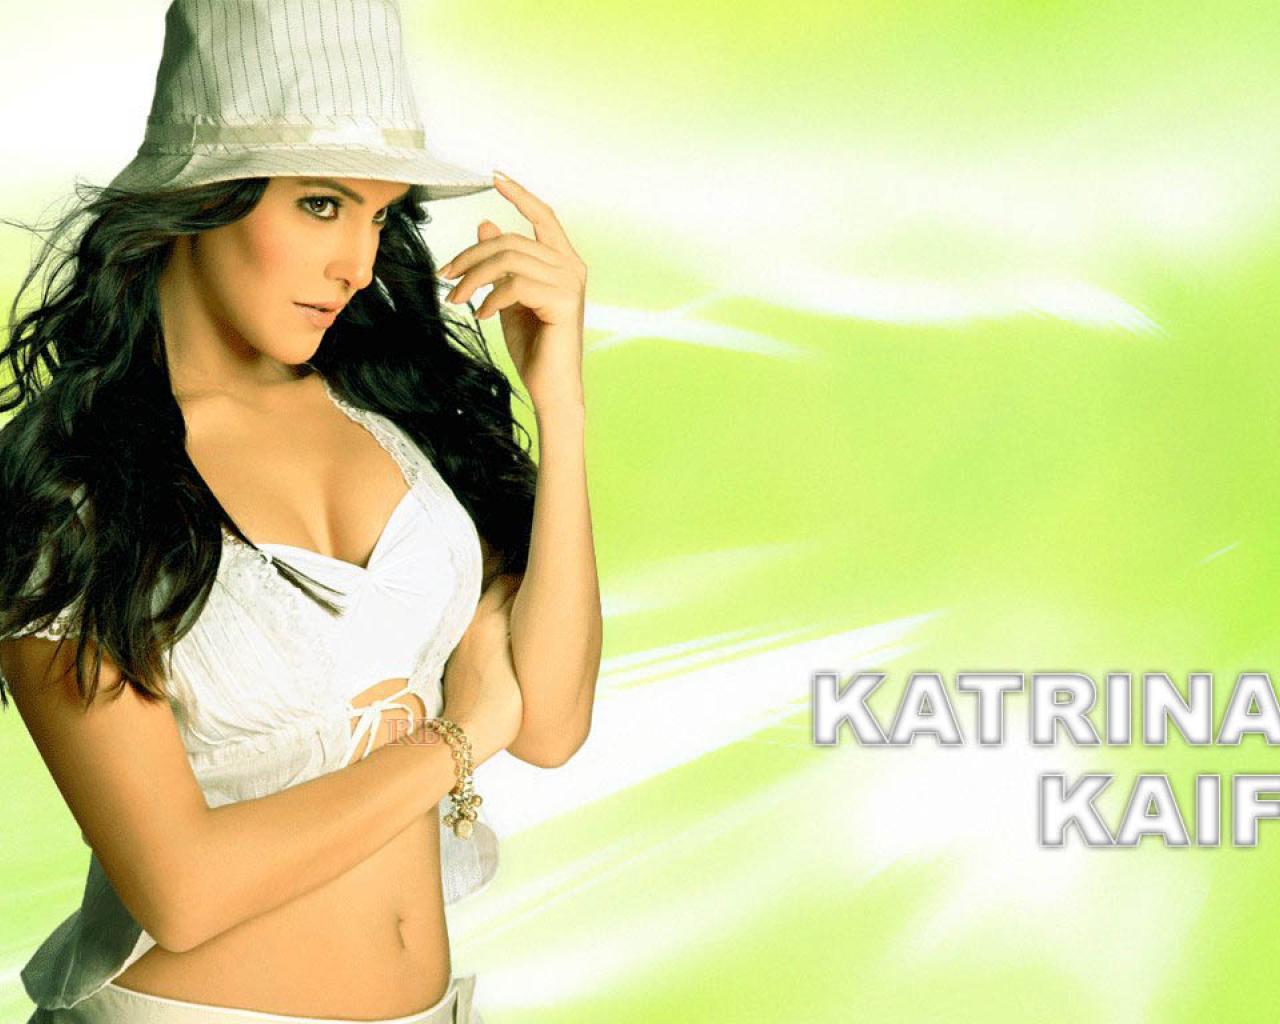 http://3.bp.blogspot.com/-u6geCrx5W3U/TzYvmL-_FhI/AAAAAAAAAAs/XDpcPtFetgU/s1600/The-best-top-desktop-hot-girl-katrina-kaif-wallpapers-hd-katrina-kaif-wallpaper-11.jpg